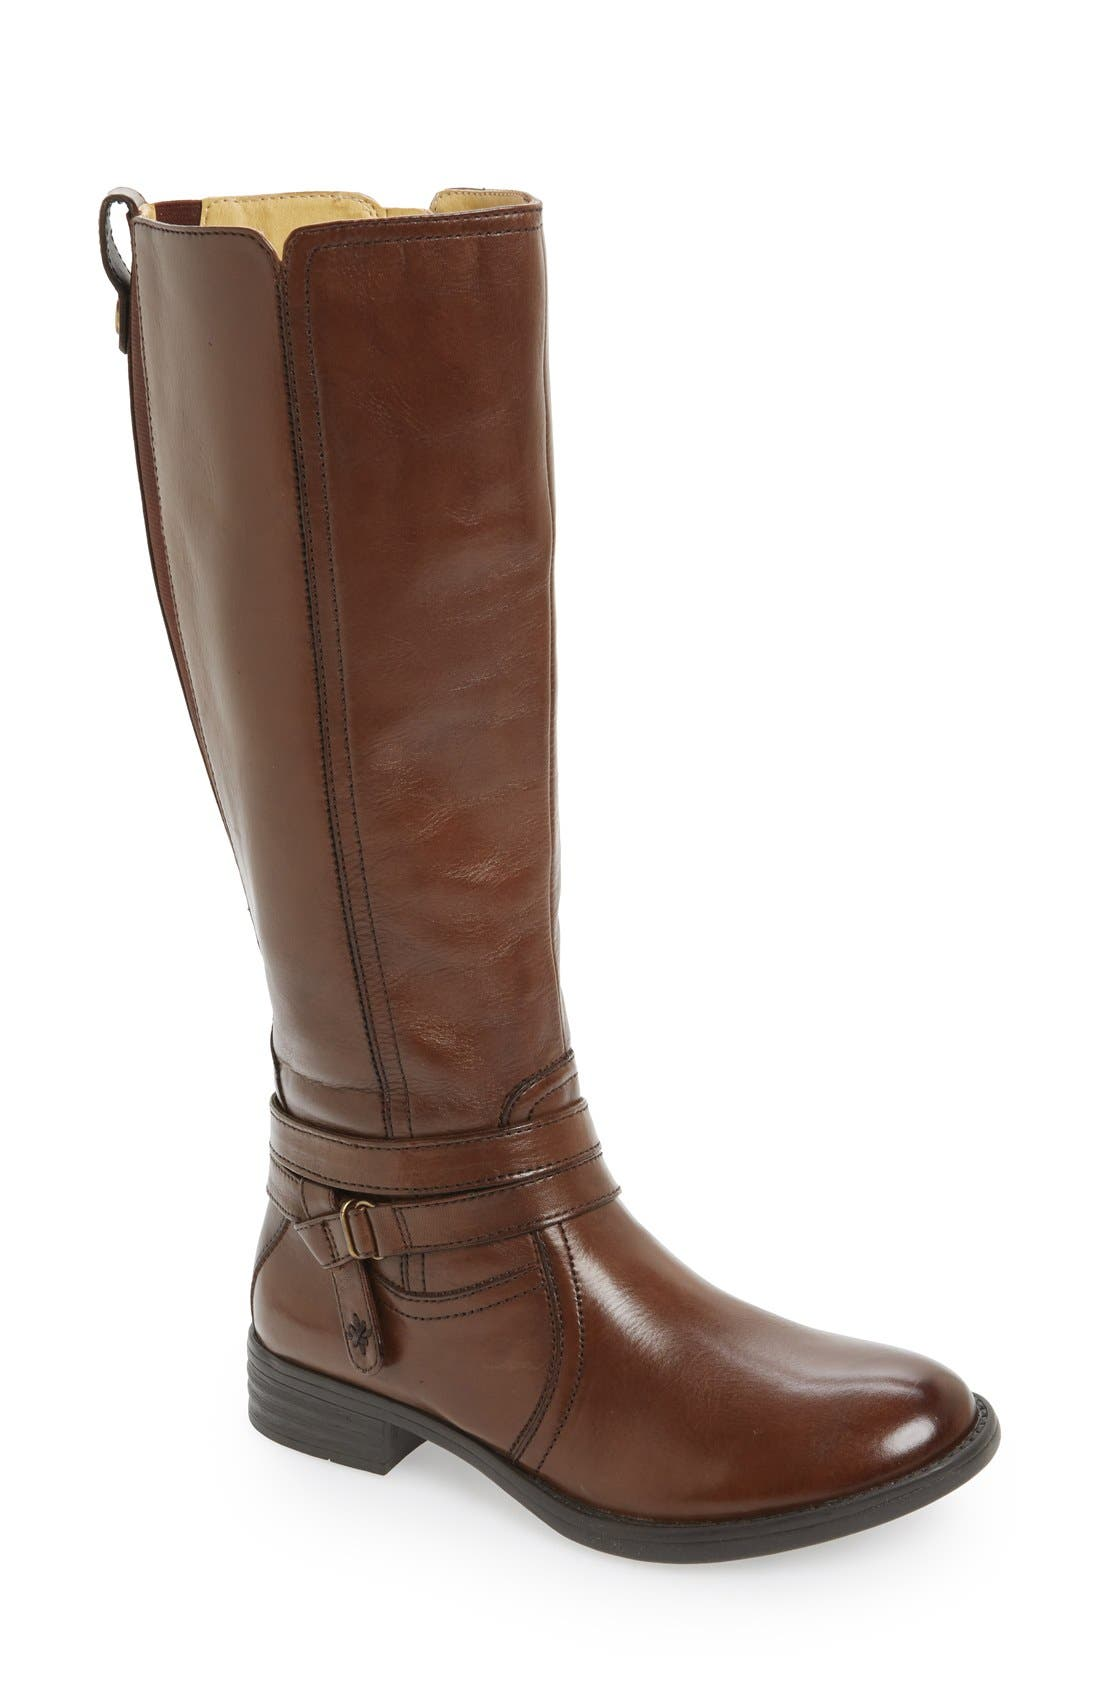 Main Image - Bussola 'Tracy' Round Toe Boot (Women)